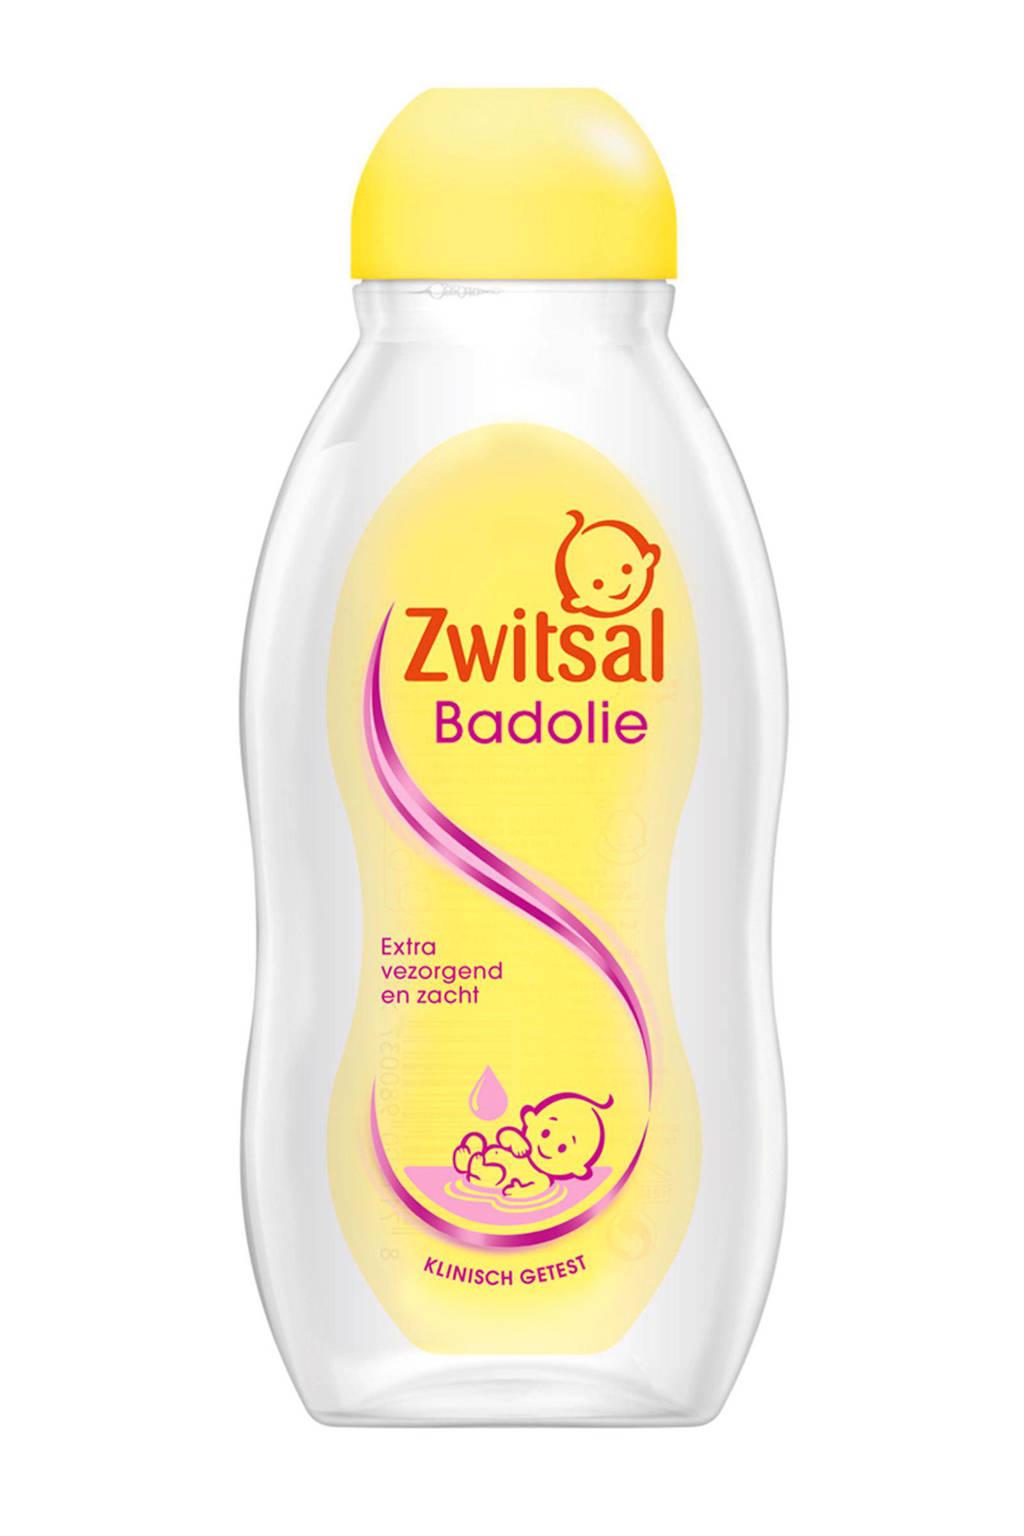 Zwitsal badolie - 200 ml - baby